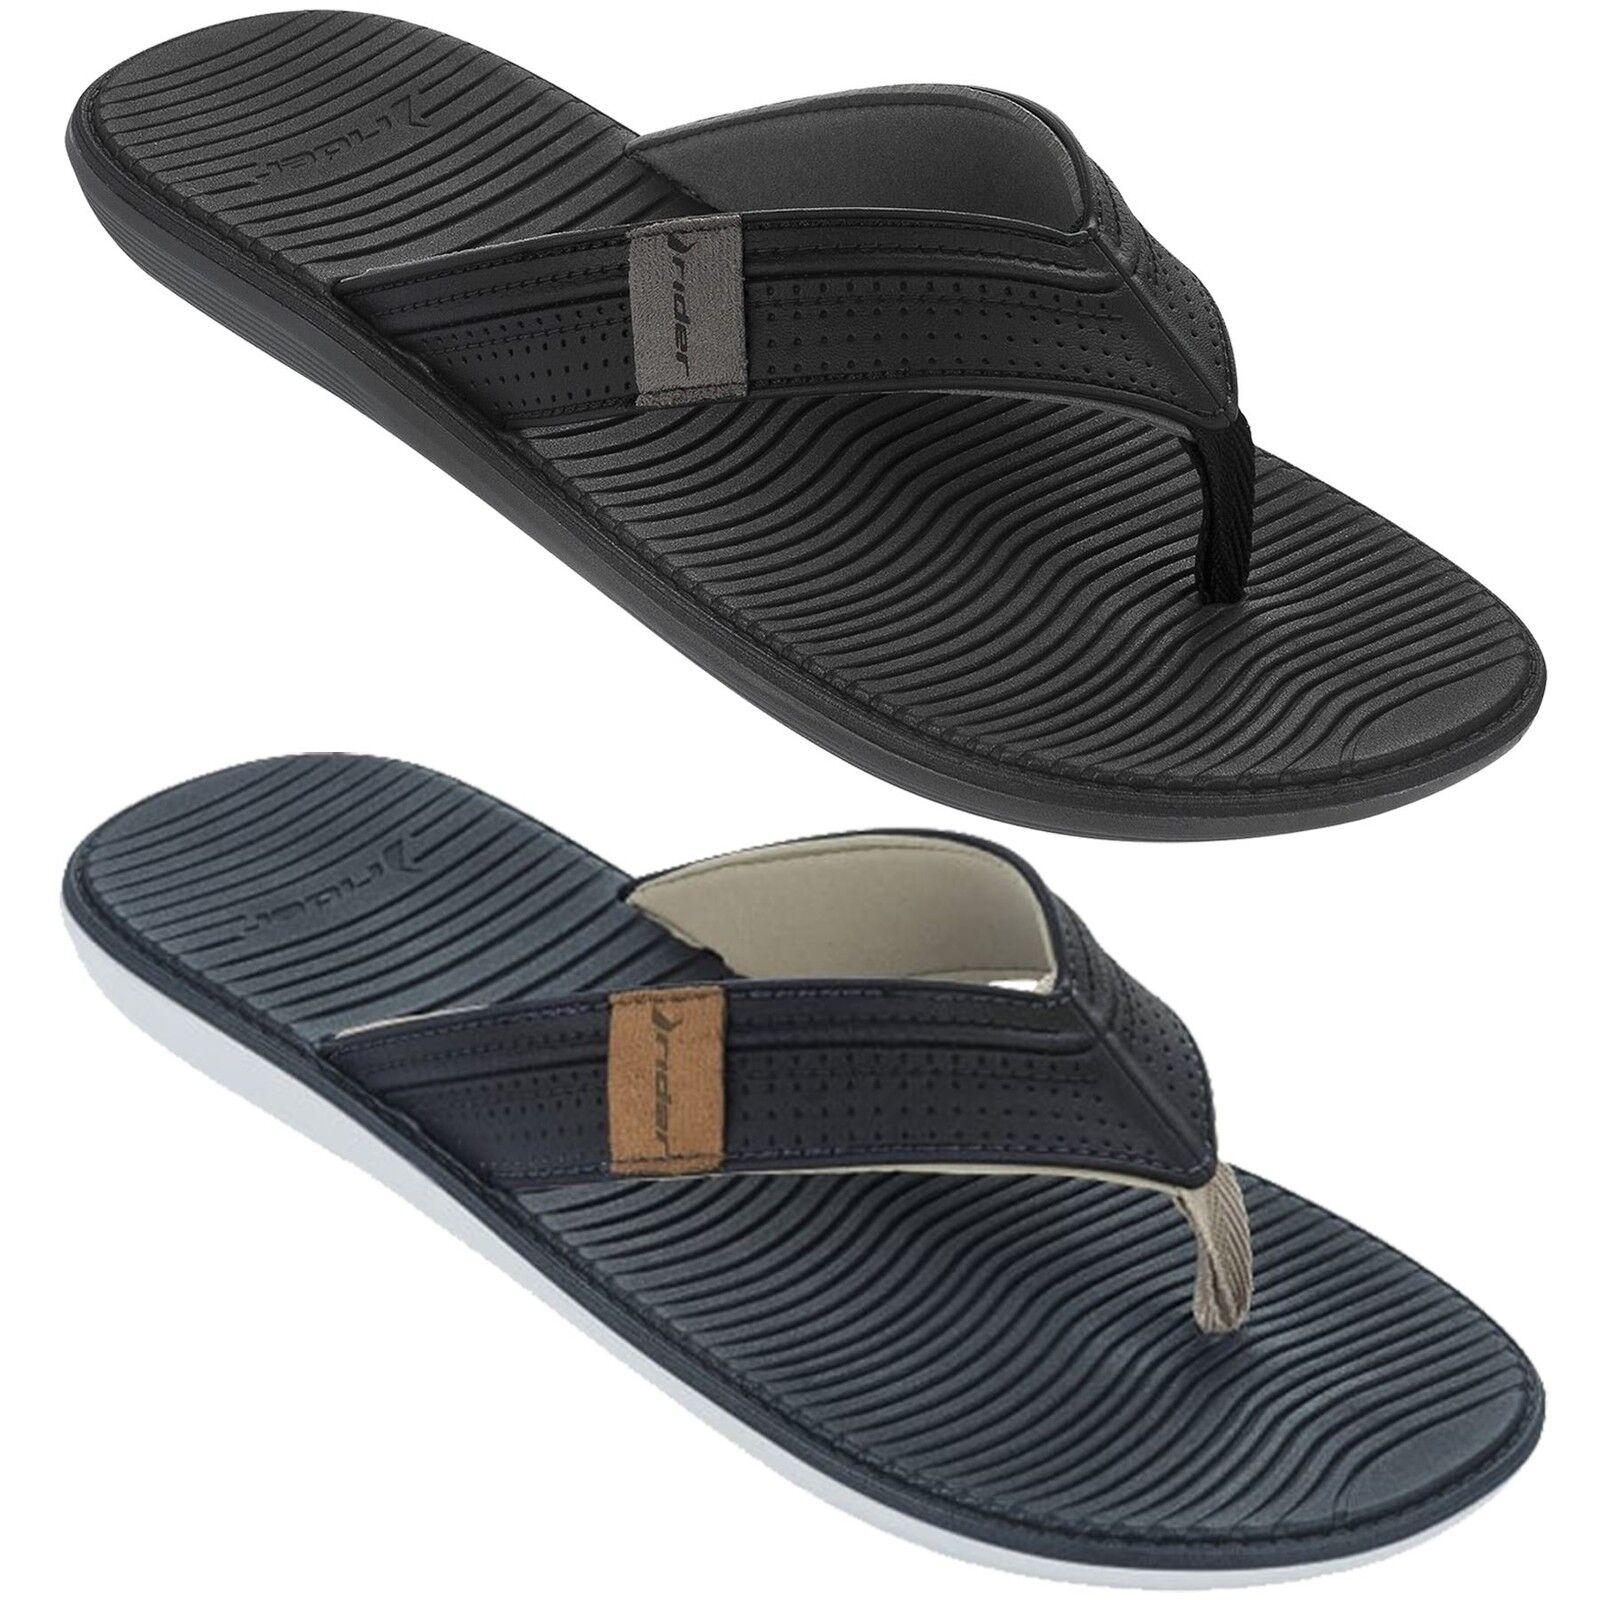 JMR007 Malta Mens Cushioned Water Repellent Non slip Flip Flops Thong Sandal